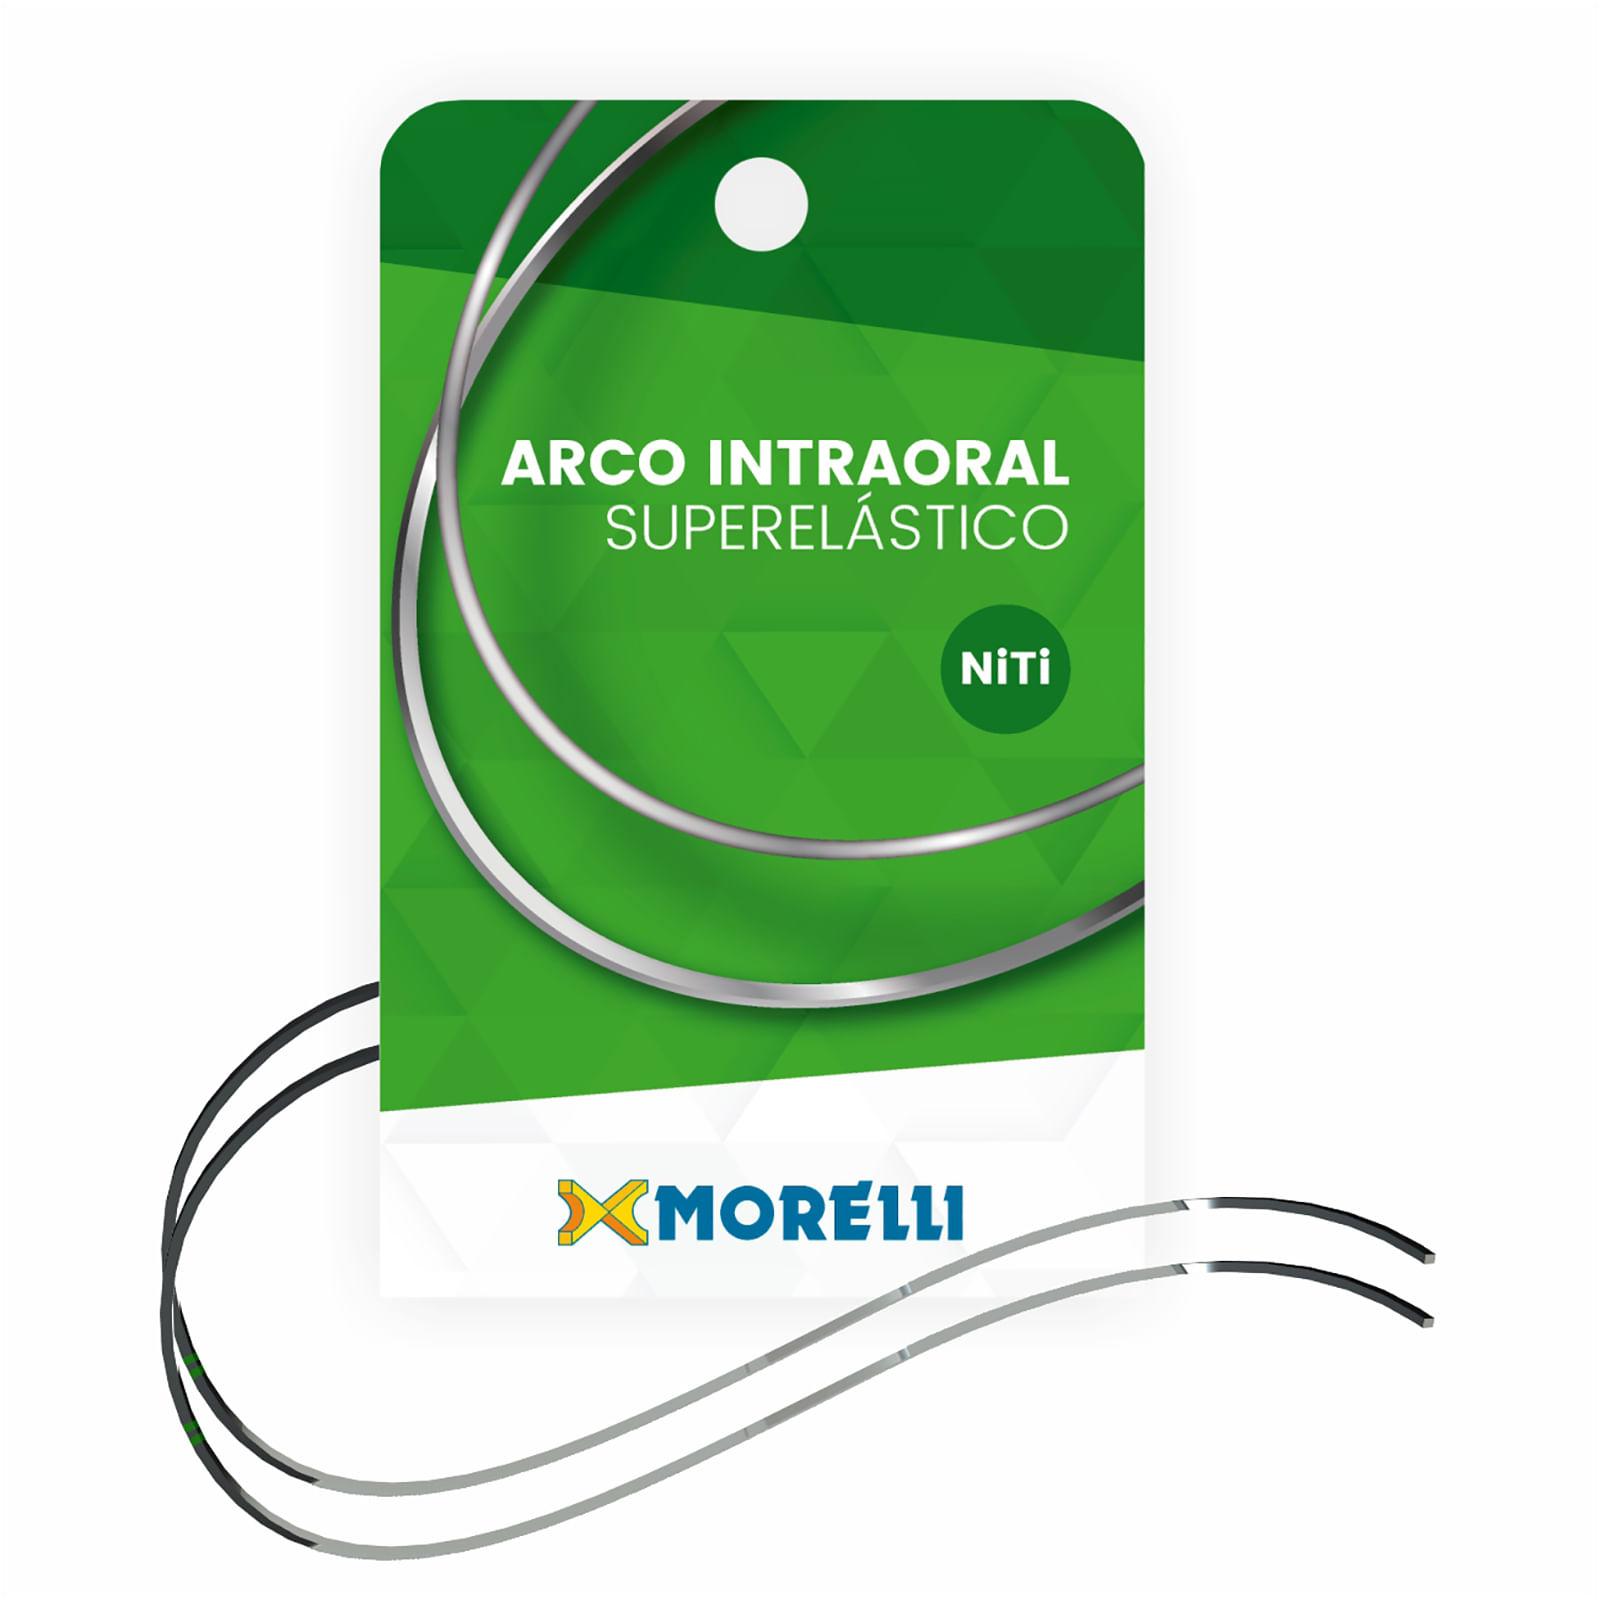 ARCO-NITINOL-SUPERELASTICO-CURVA-REVERSO-MEDIO---INFERIOR---NITI---RETANGULAR-.016-X.022----MORELLI